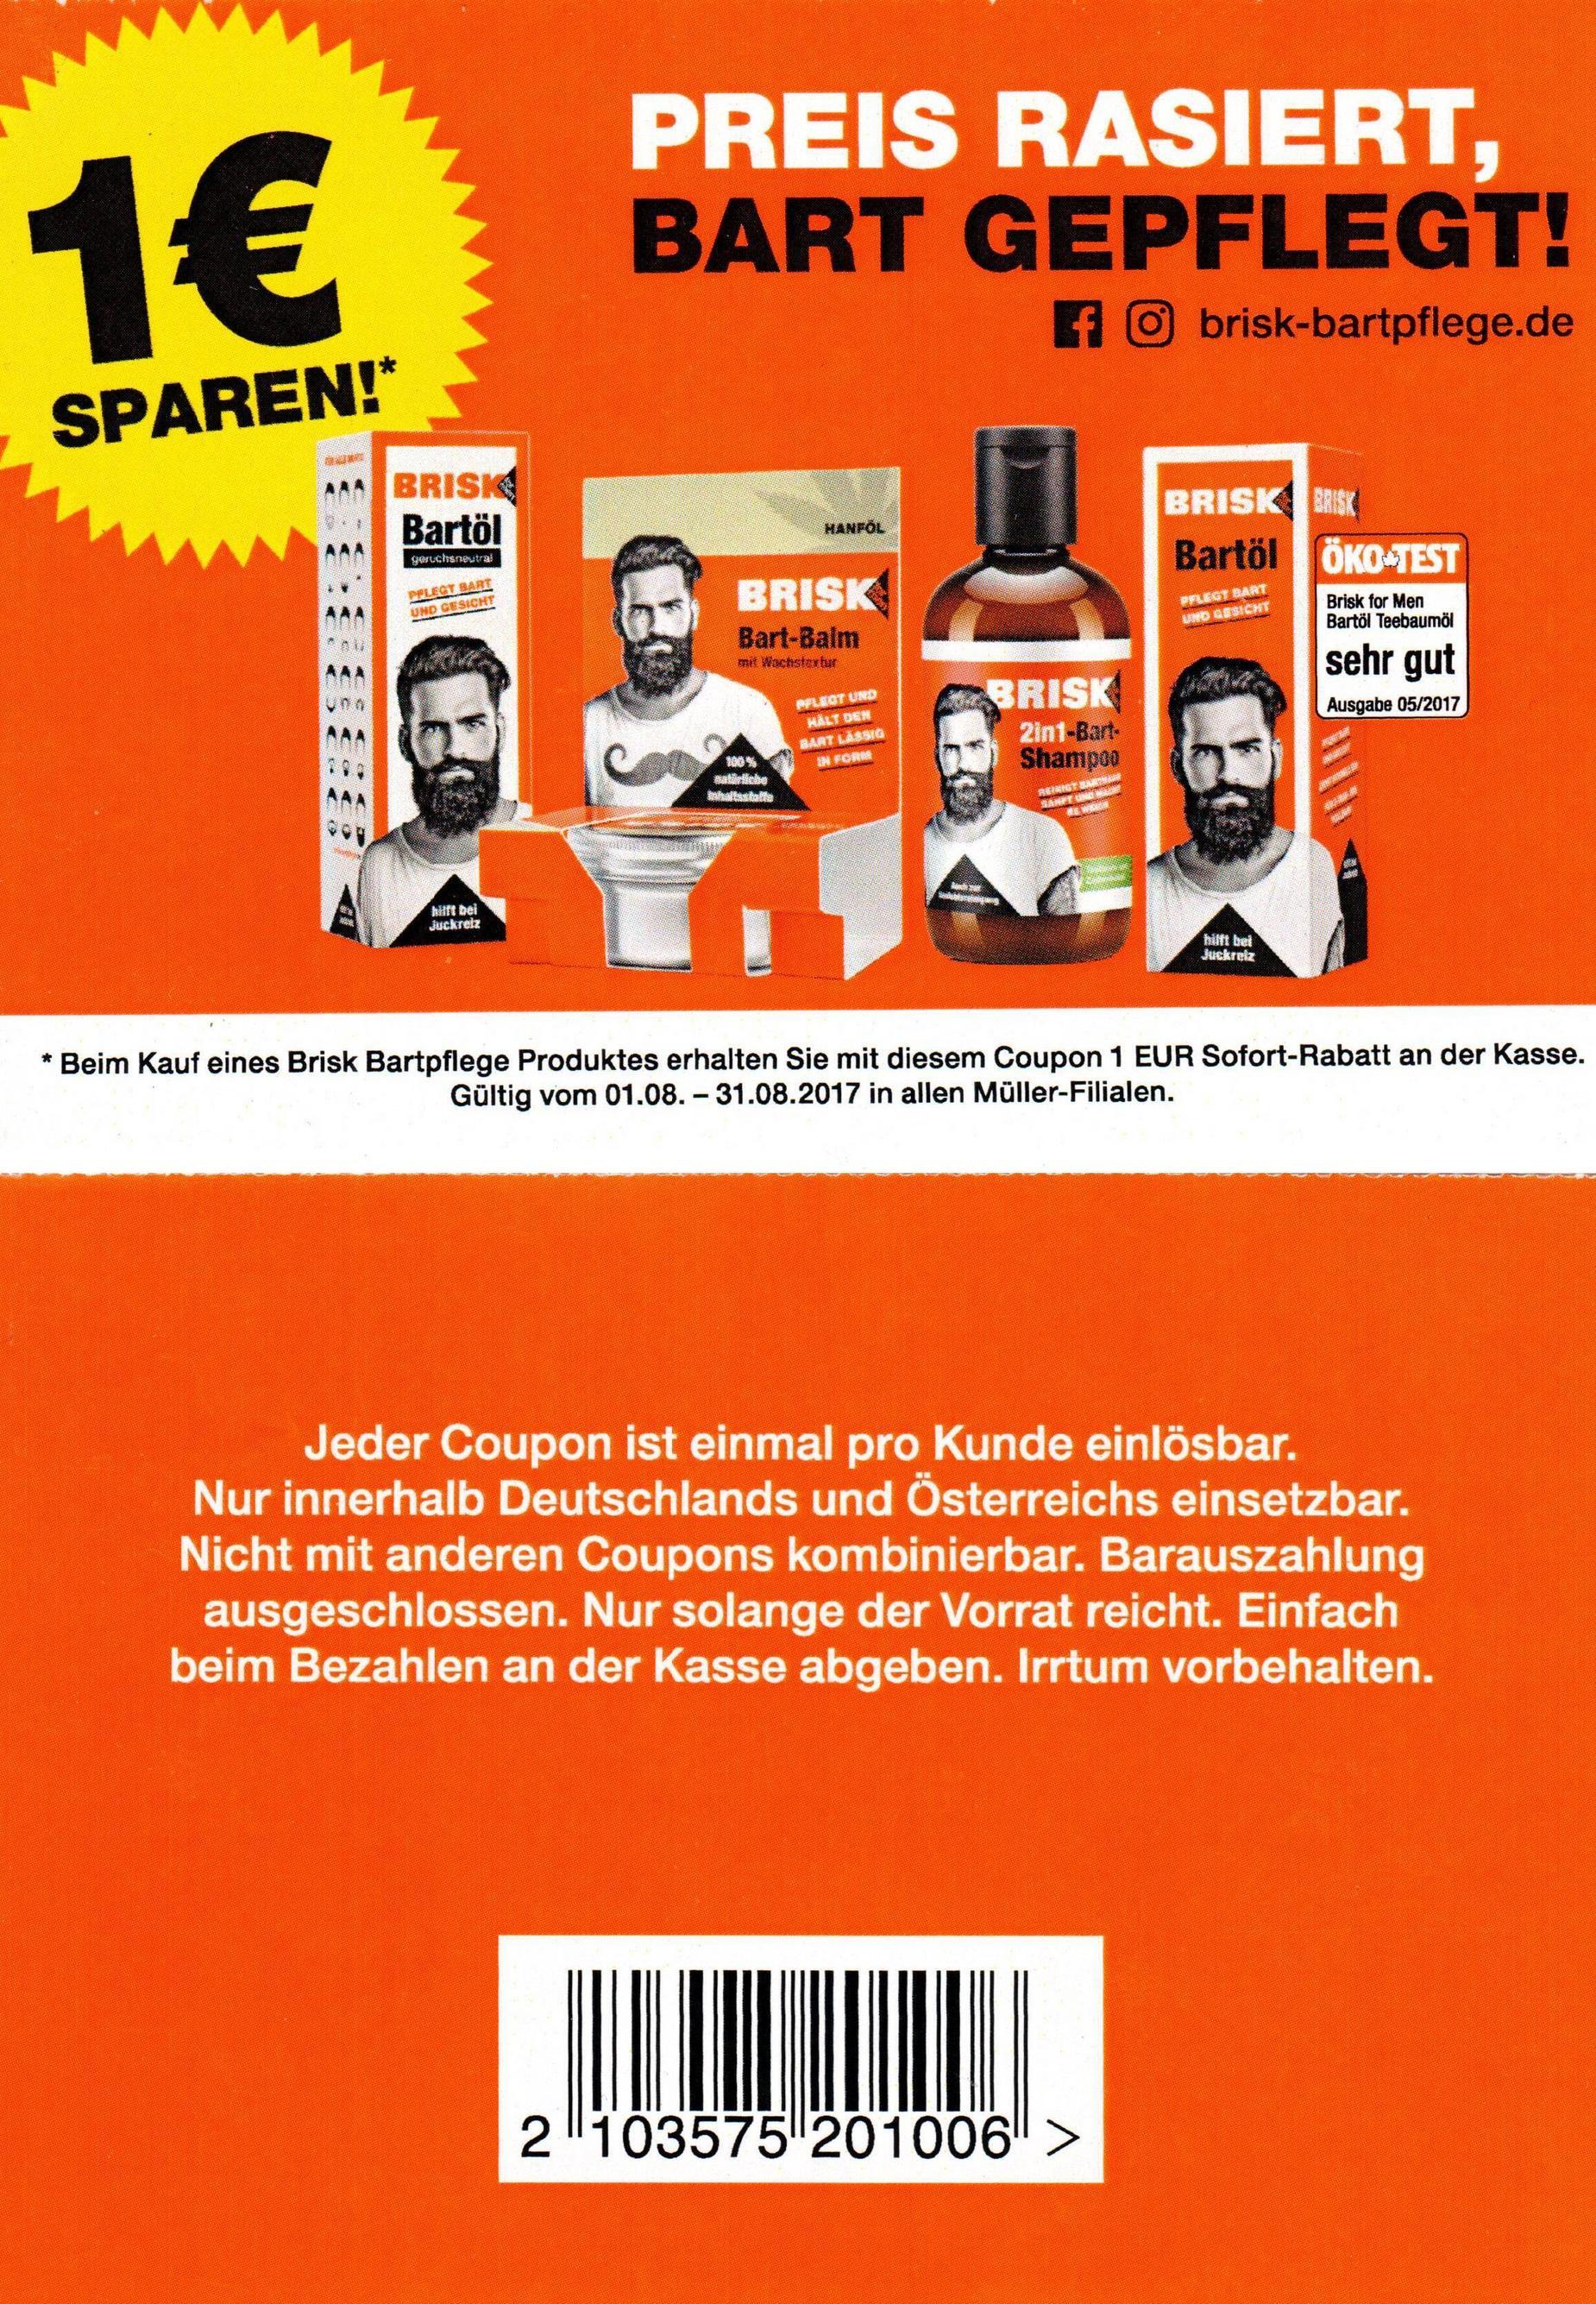 1,00€ Sofort-Rabatt-Coupon für 1 Brisk Bartpflege Produkt bis 31.08.2017 [Müller D+AT]